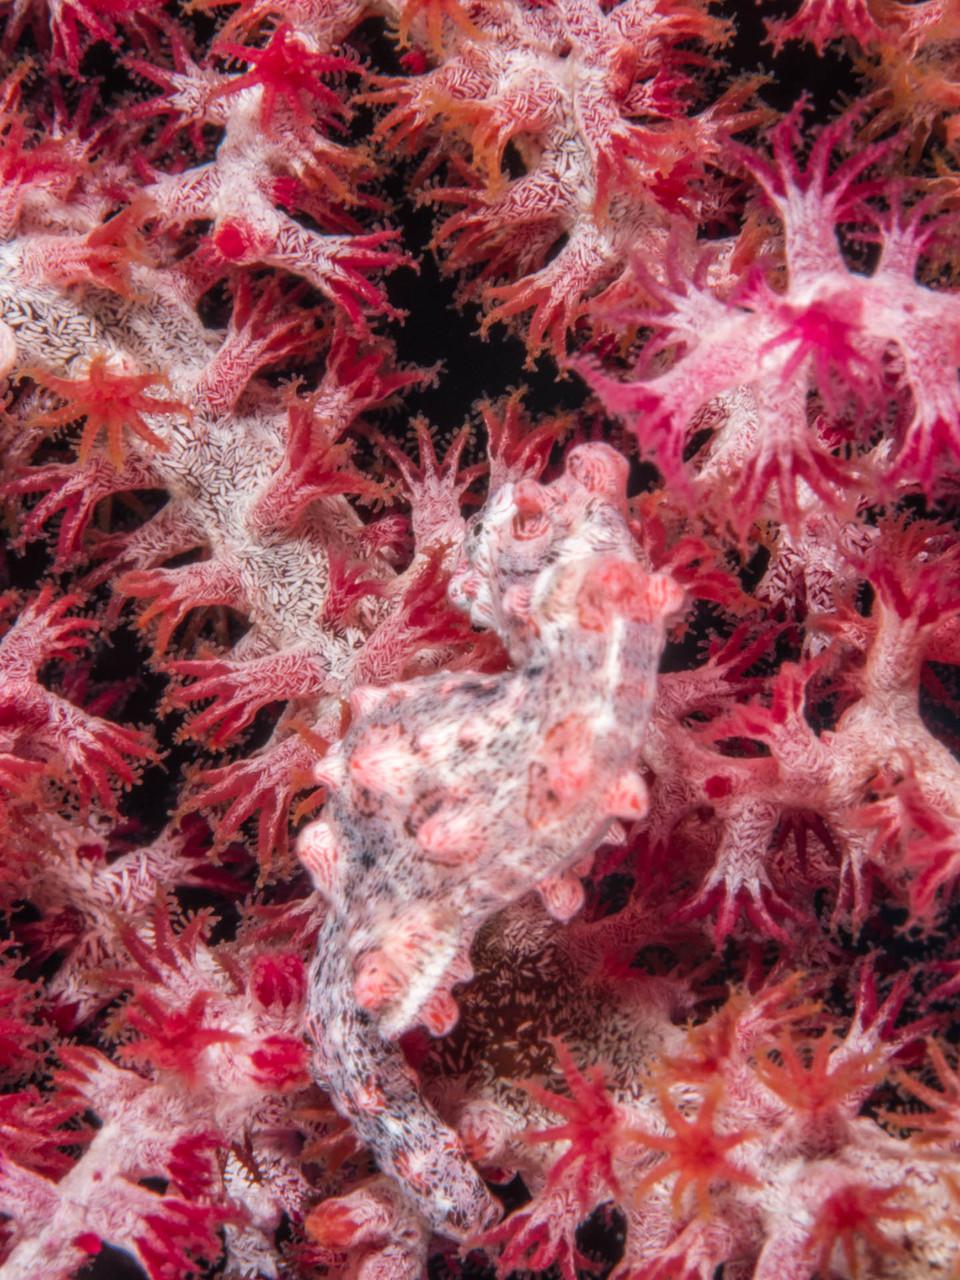 Pygmy seahorse (around 1.5 cm long)